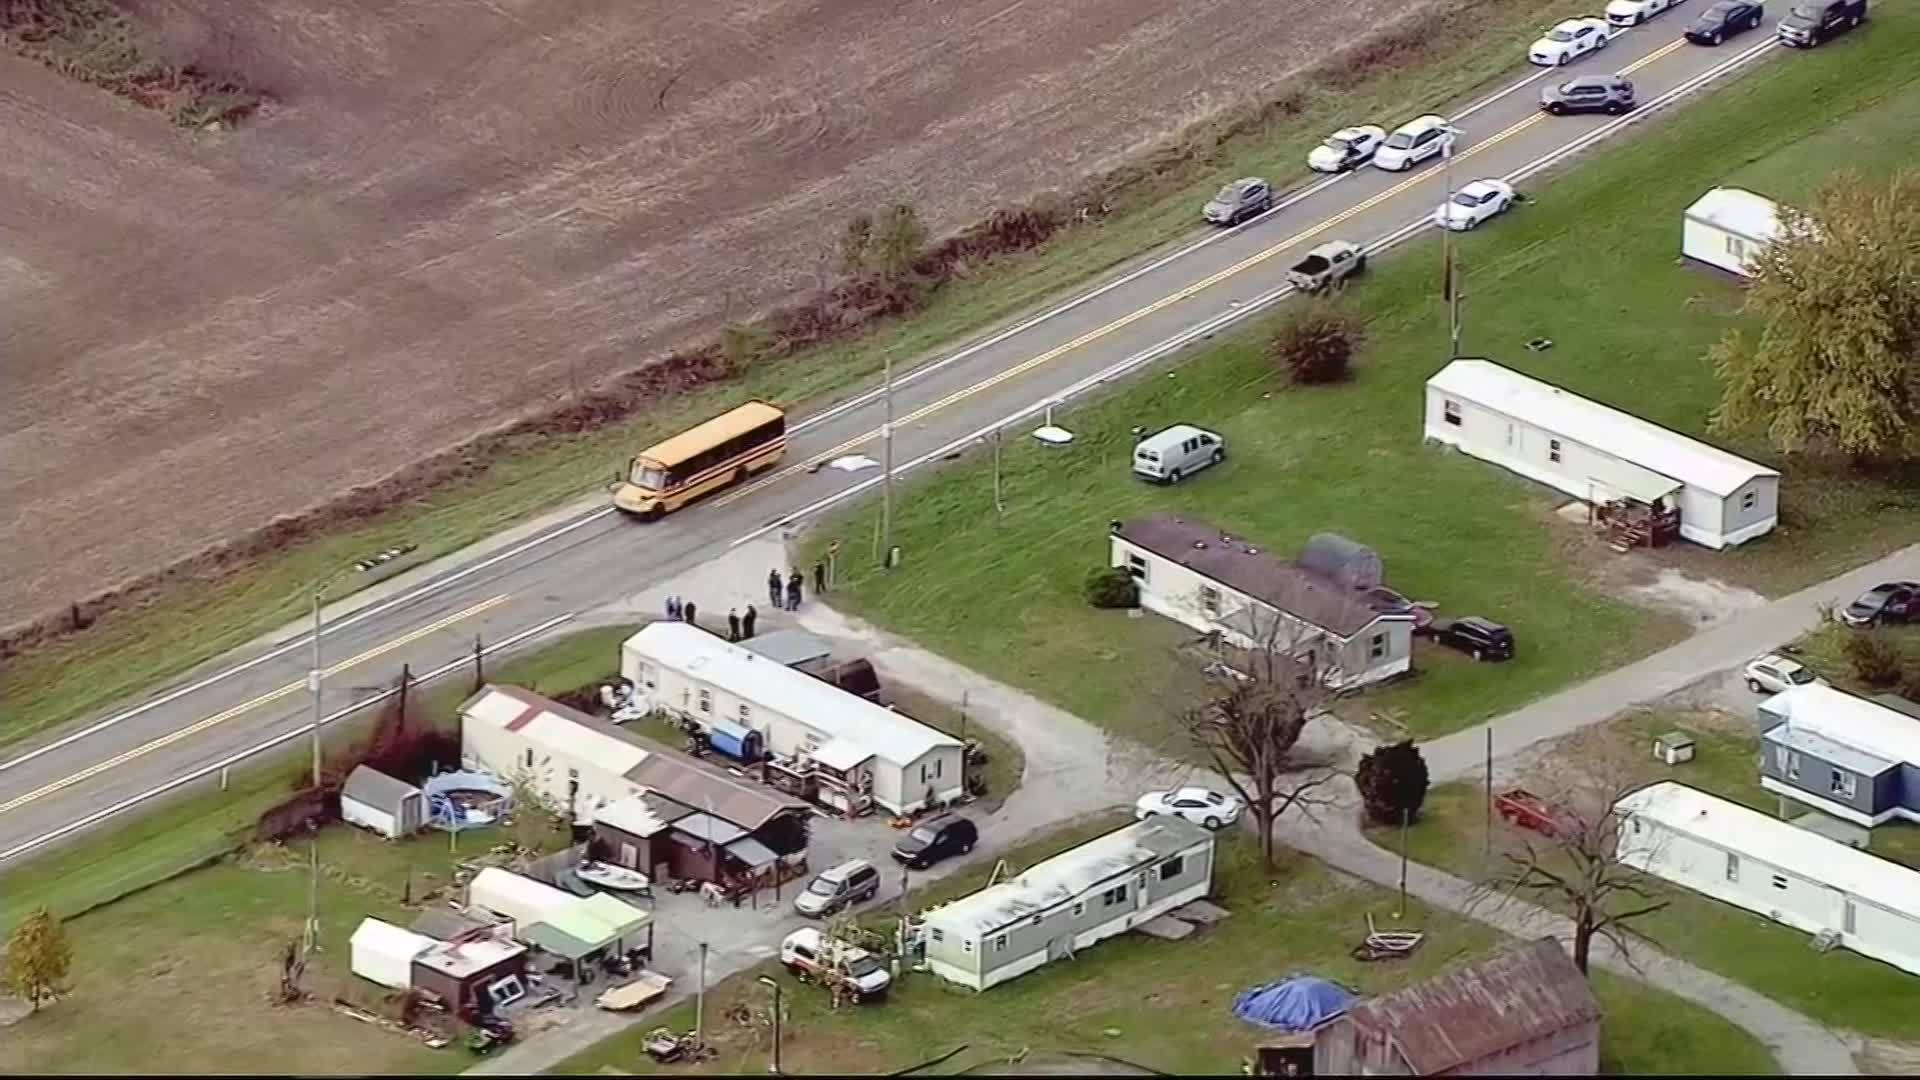 3 CHILDREN KILLED, 1 INJURED AT BUS STOP